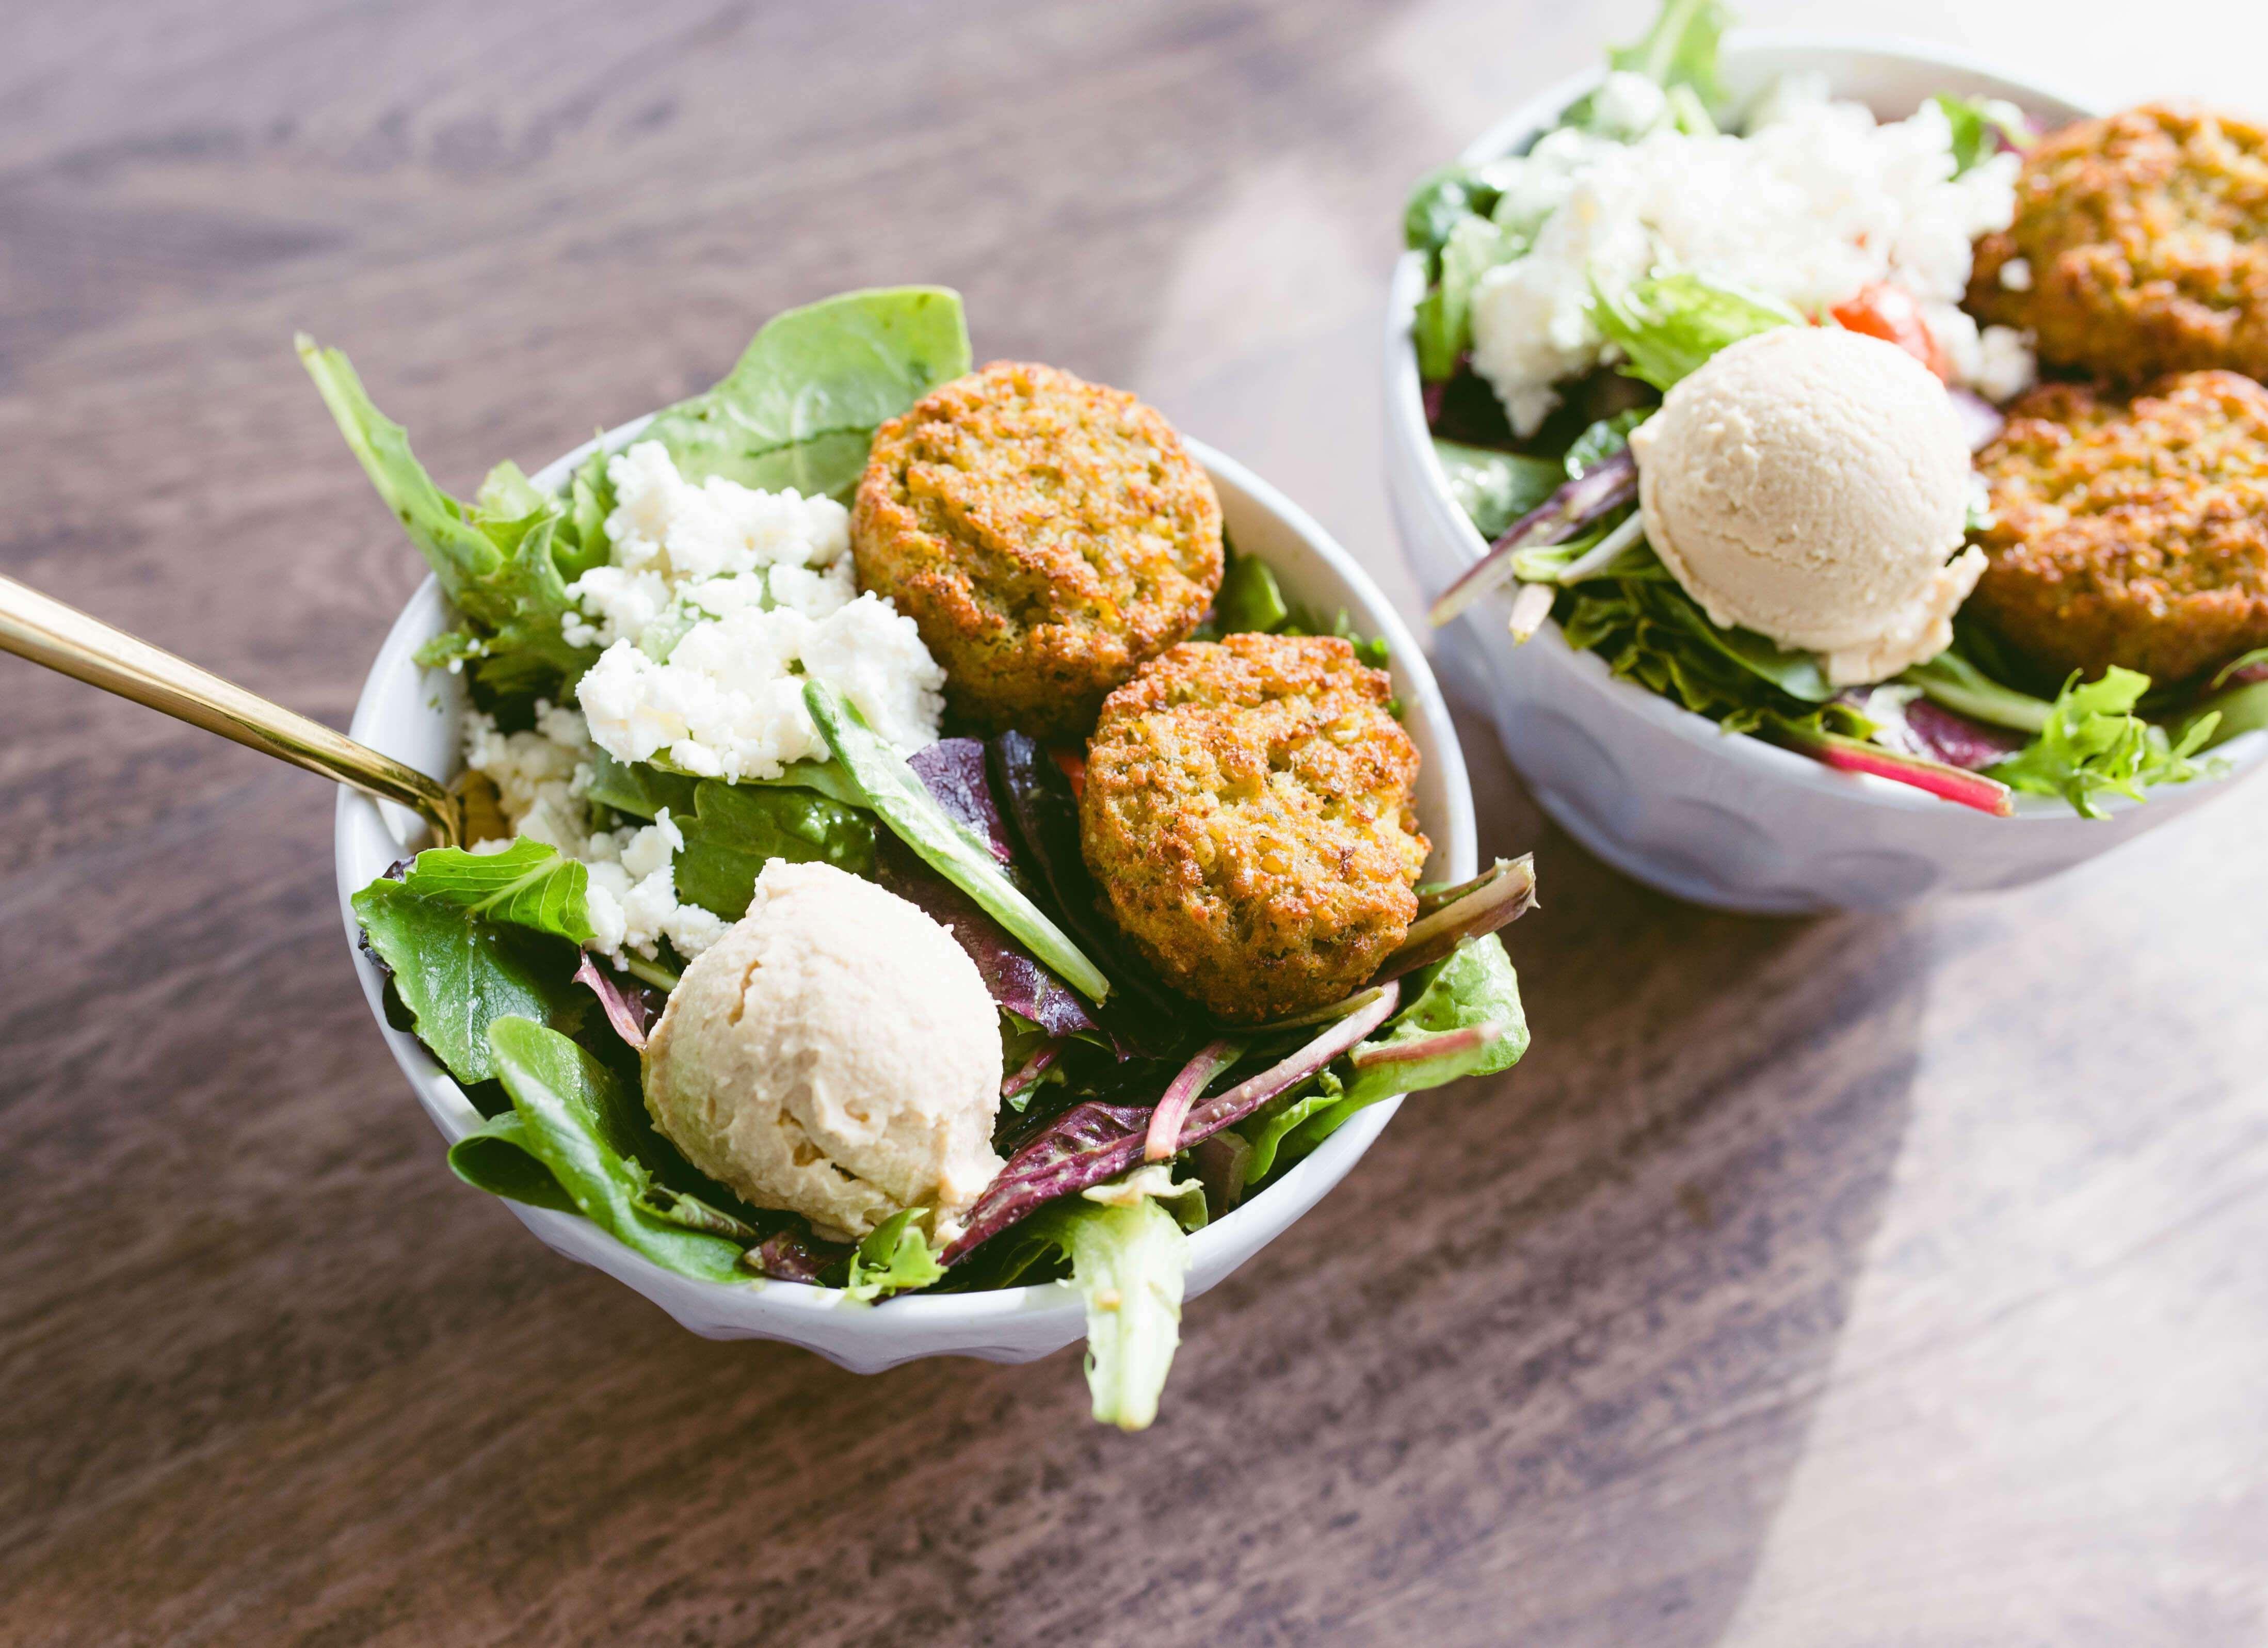 Sweetgreen Hummus Tahina Salad At Home Twinspiration Quick Easy Meals Spring Mix Salad Recipes [ 3193 x 4395 Pixel ]